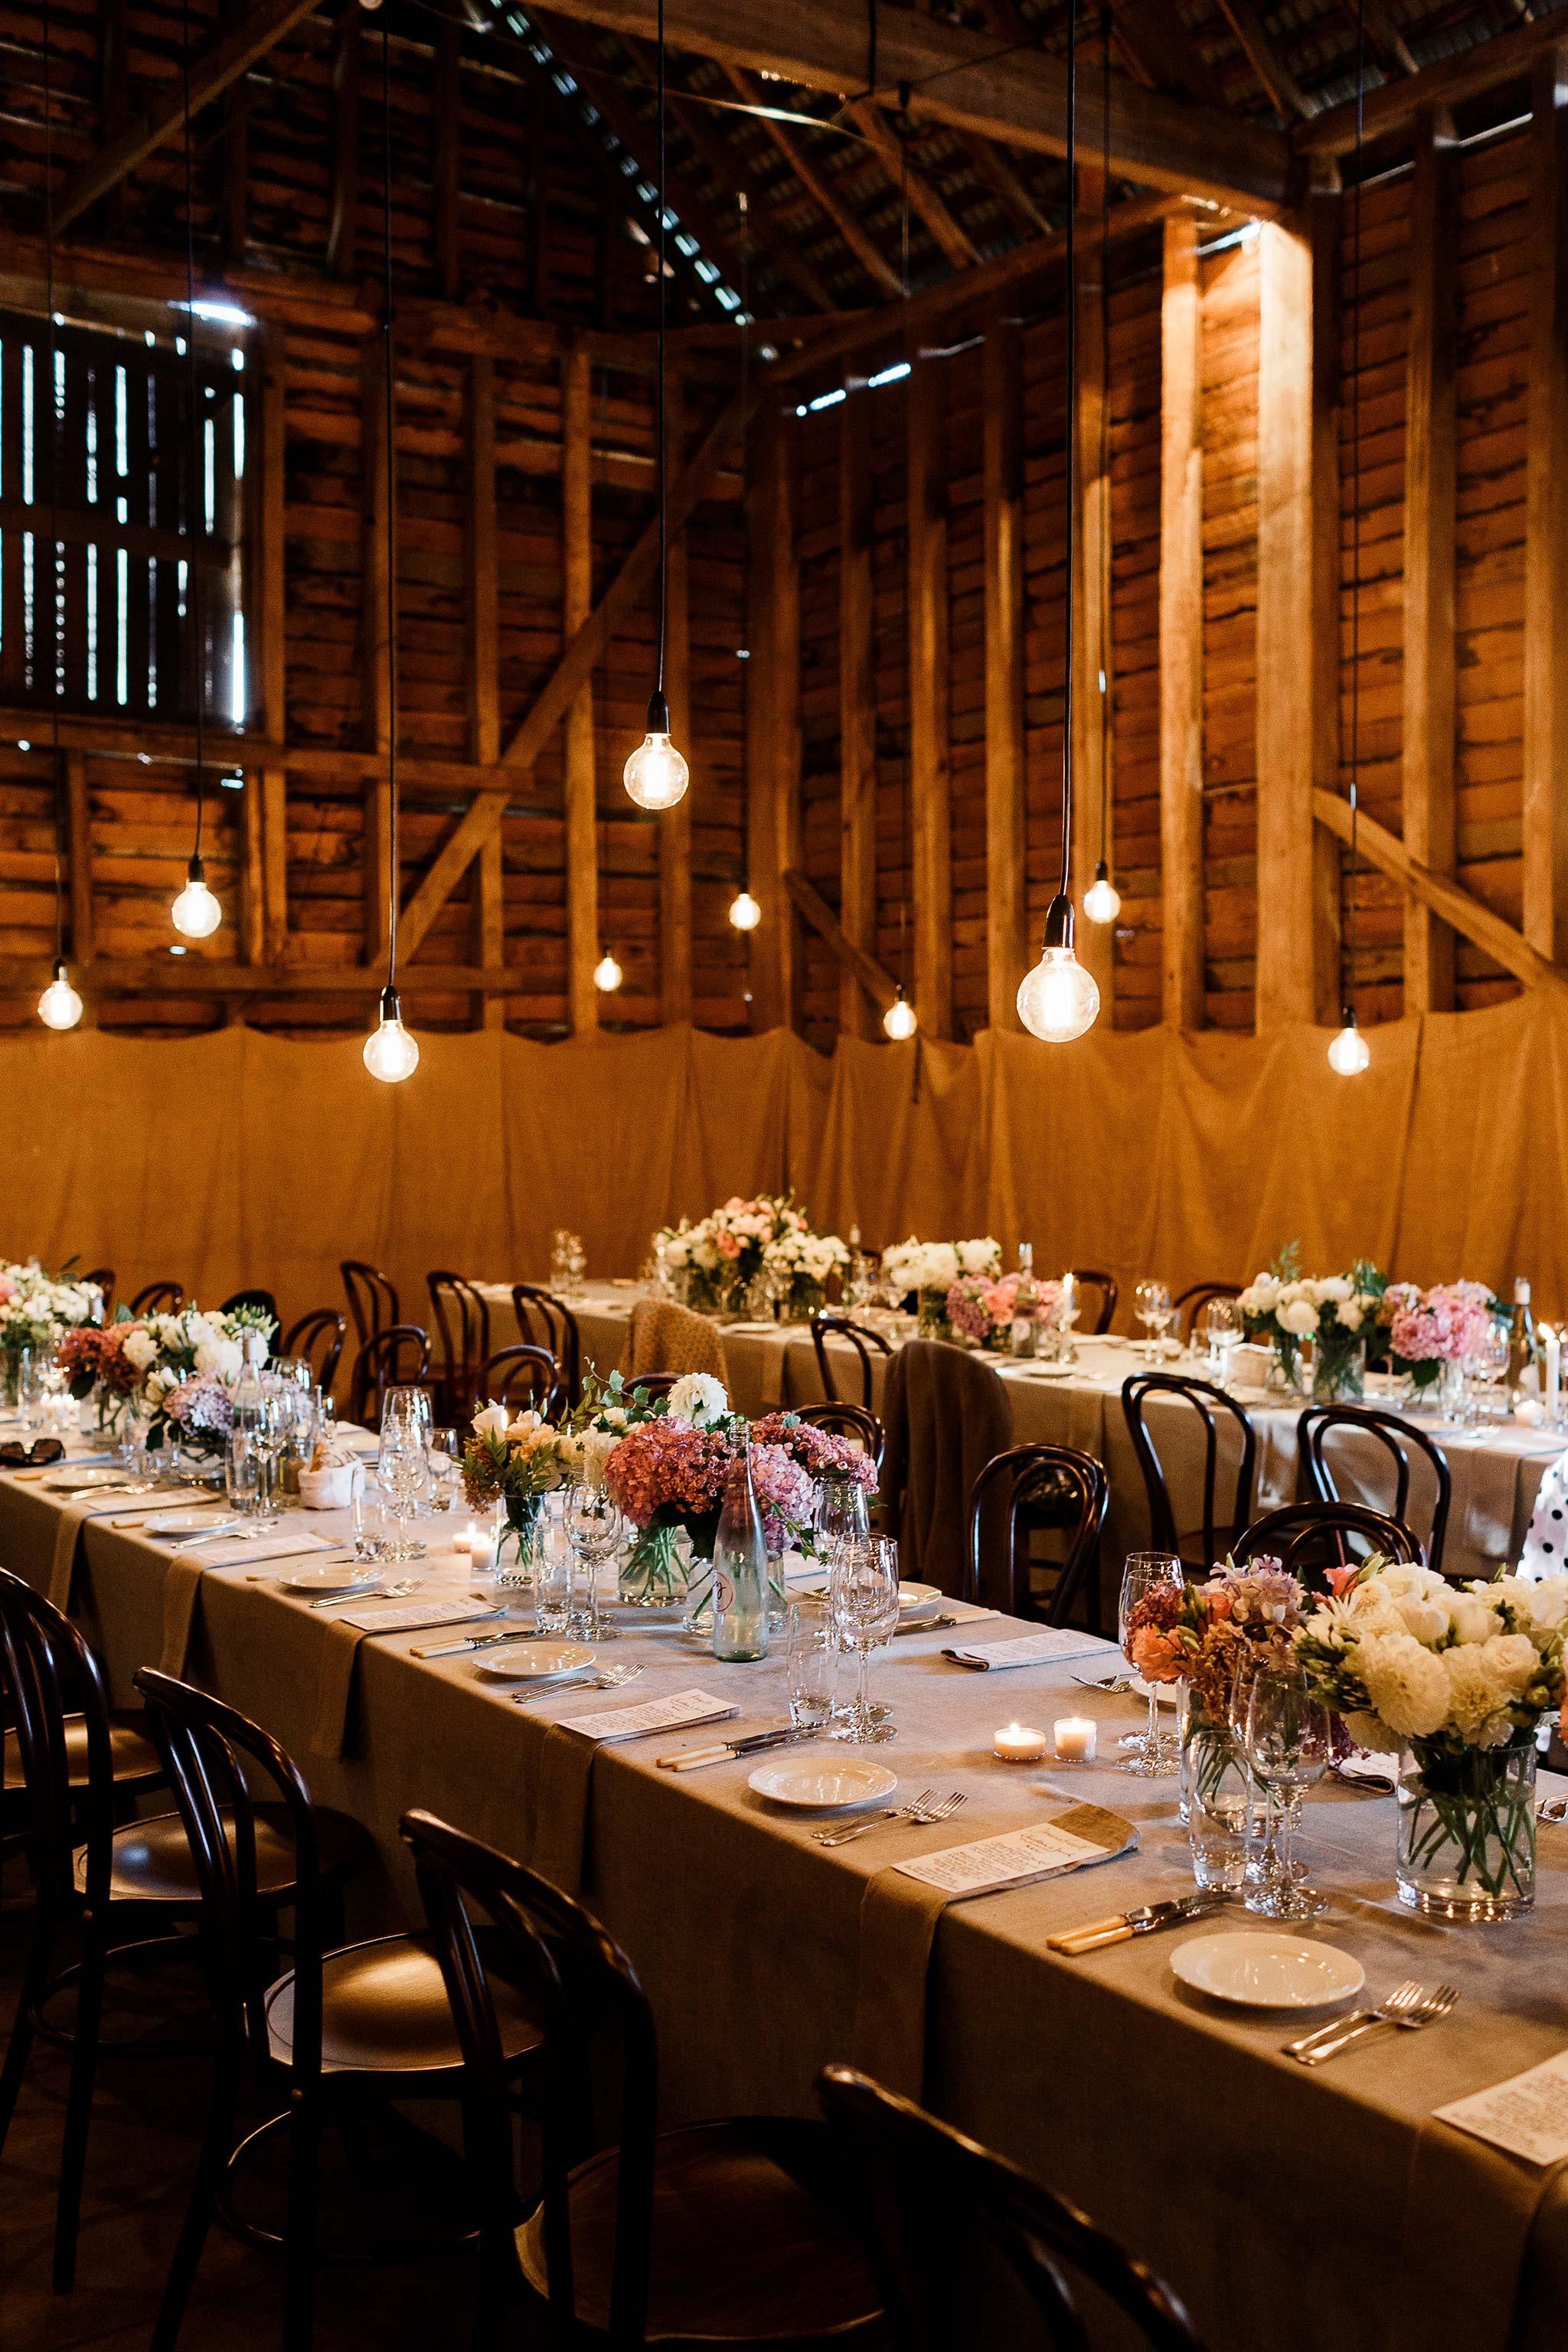 Launceston-Brickendon-barn-Wedding-Photographer-reception-set-up